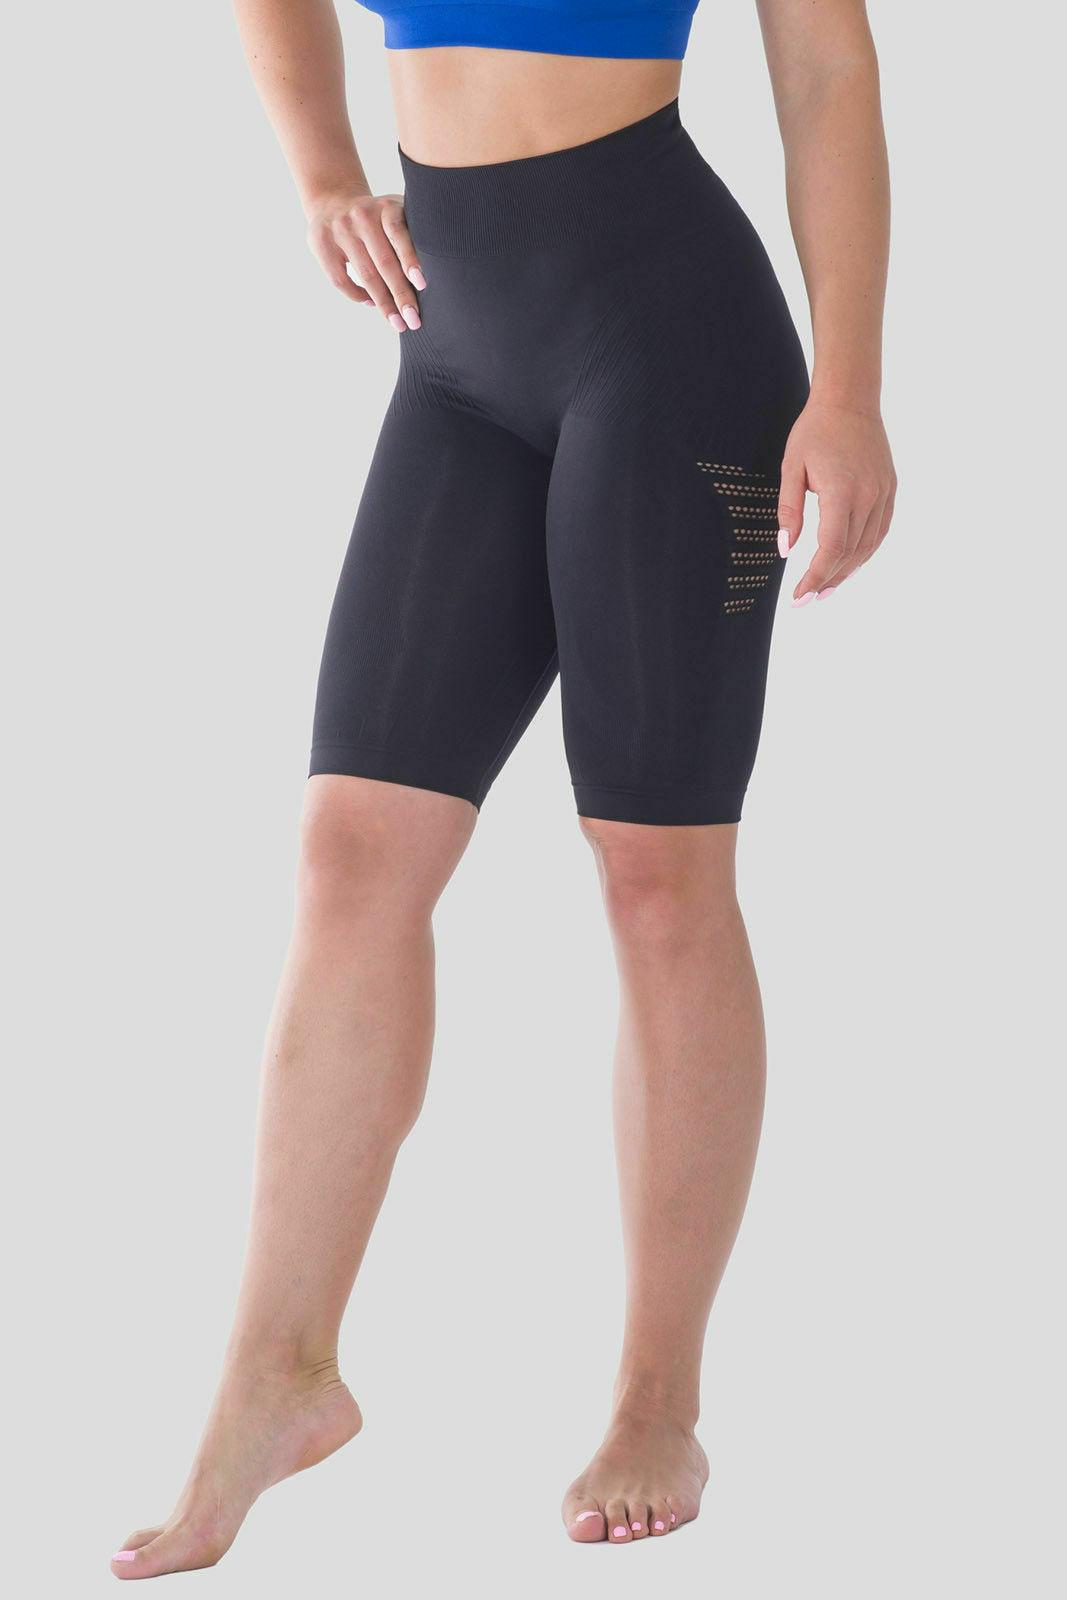 Bellissima-Women-039-s-Compression-Sport-Yoga-Shorts-High-Waist-Workout-Running thumbnail 22